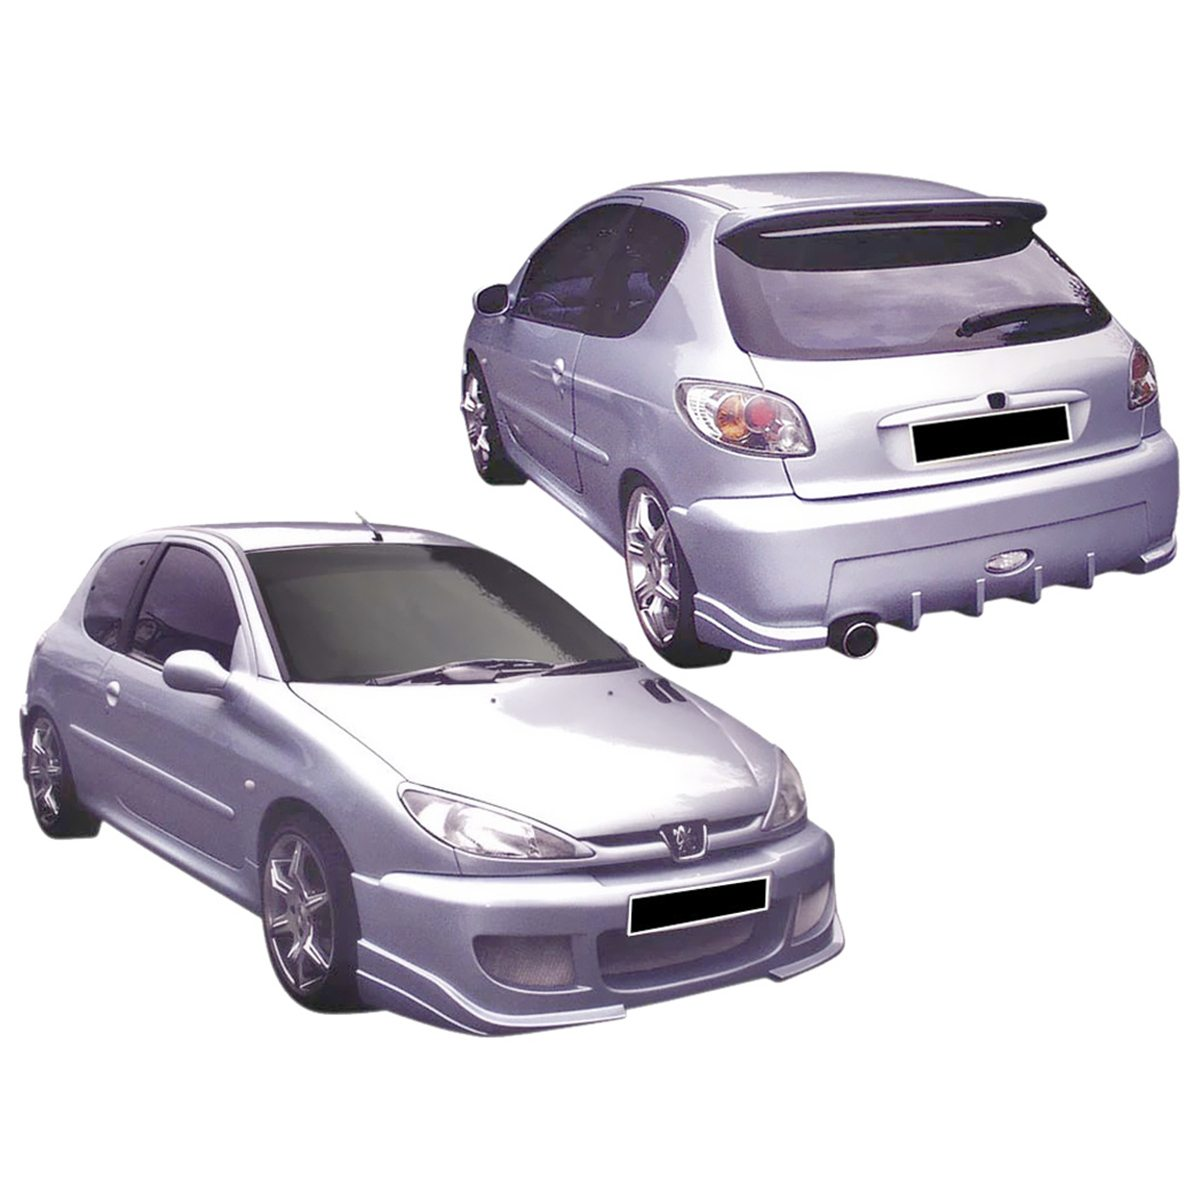 Peugeot-206-Inigma-KIT-KTC012